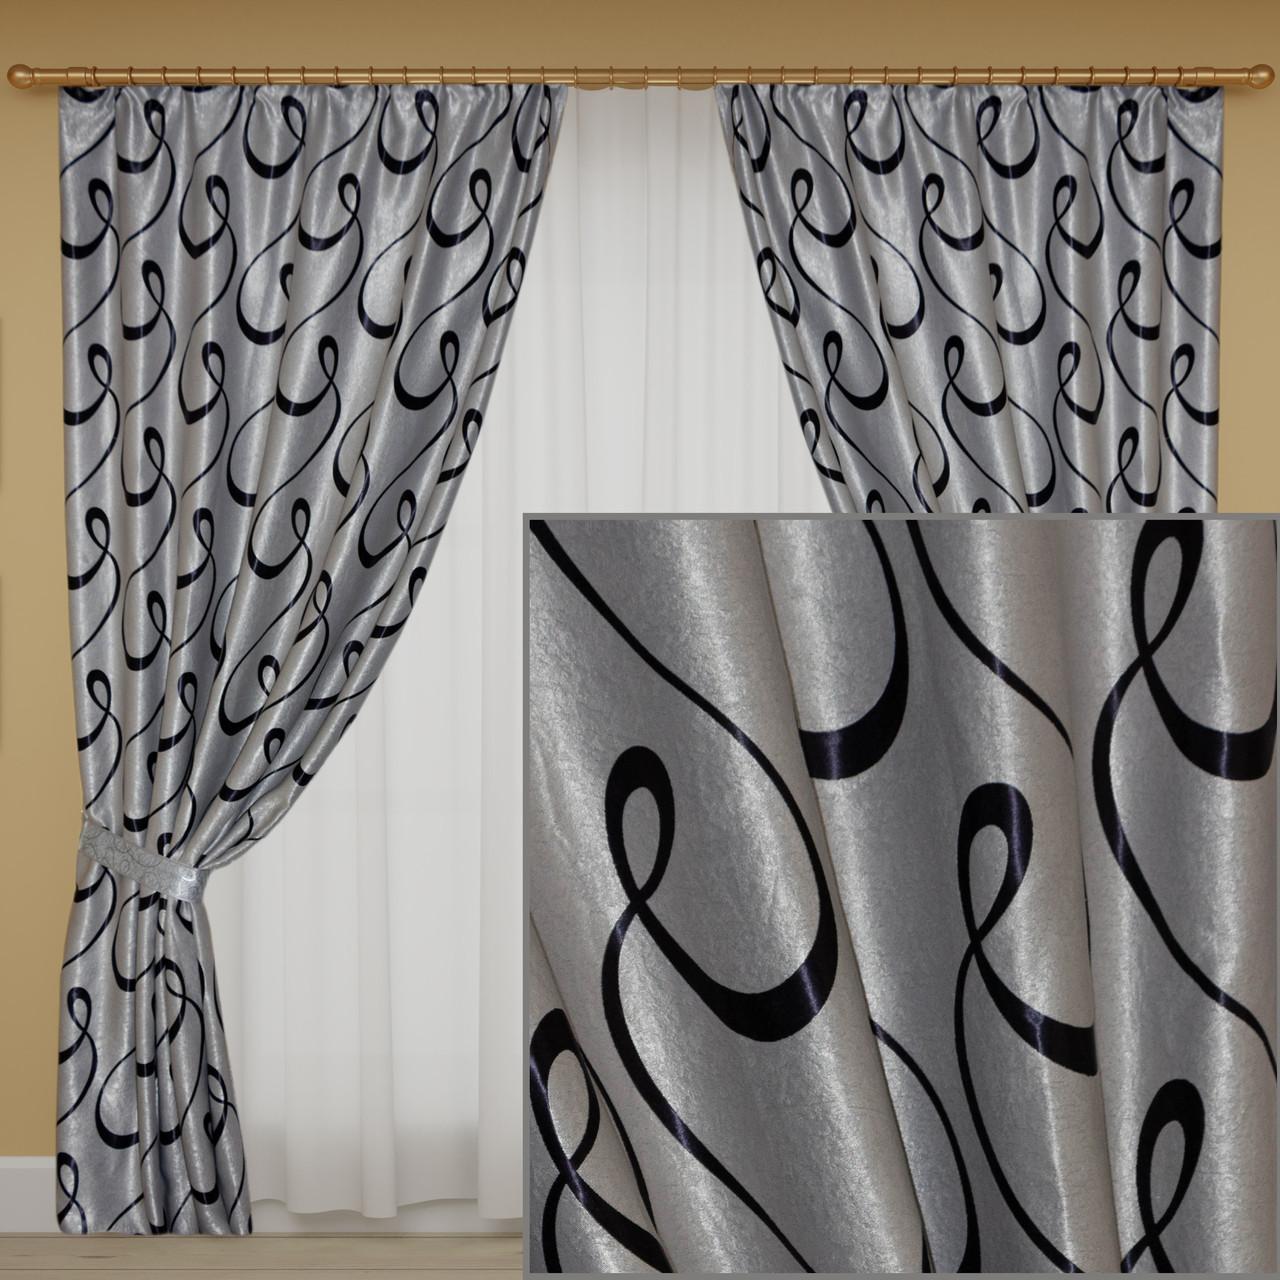 Готовые шторы блэкаут, серые с узором